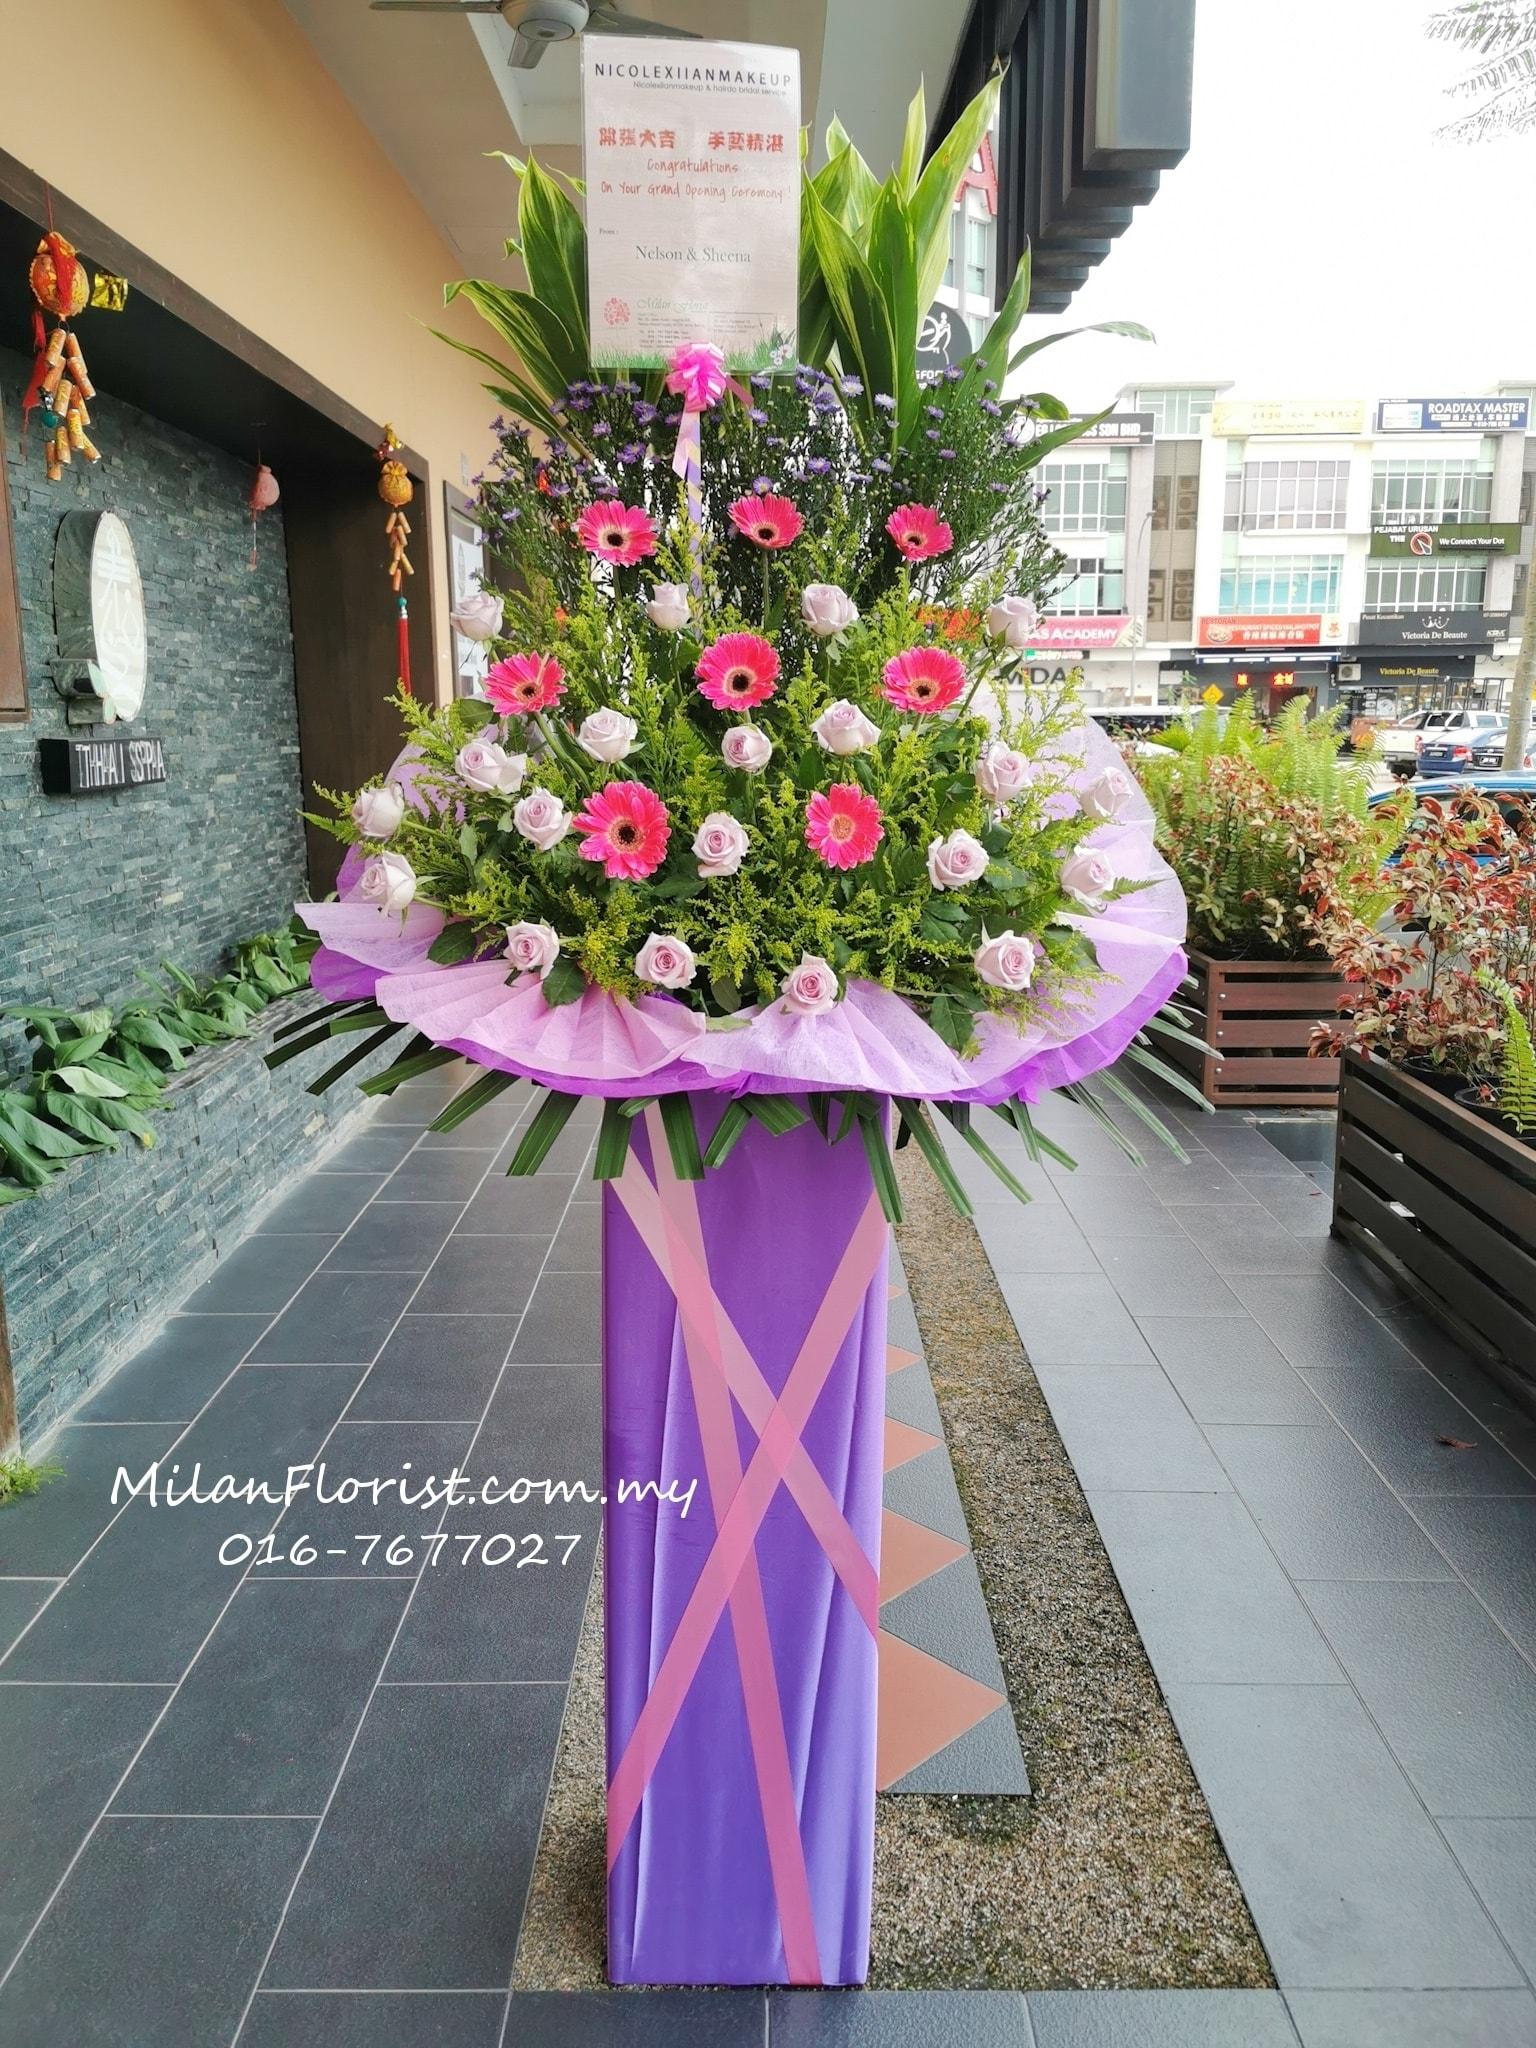 Budget flower stand